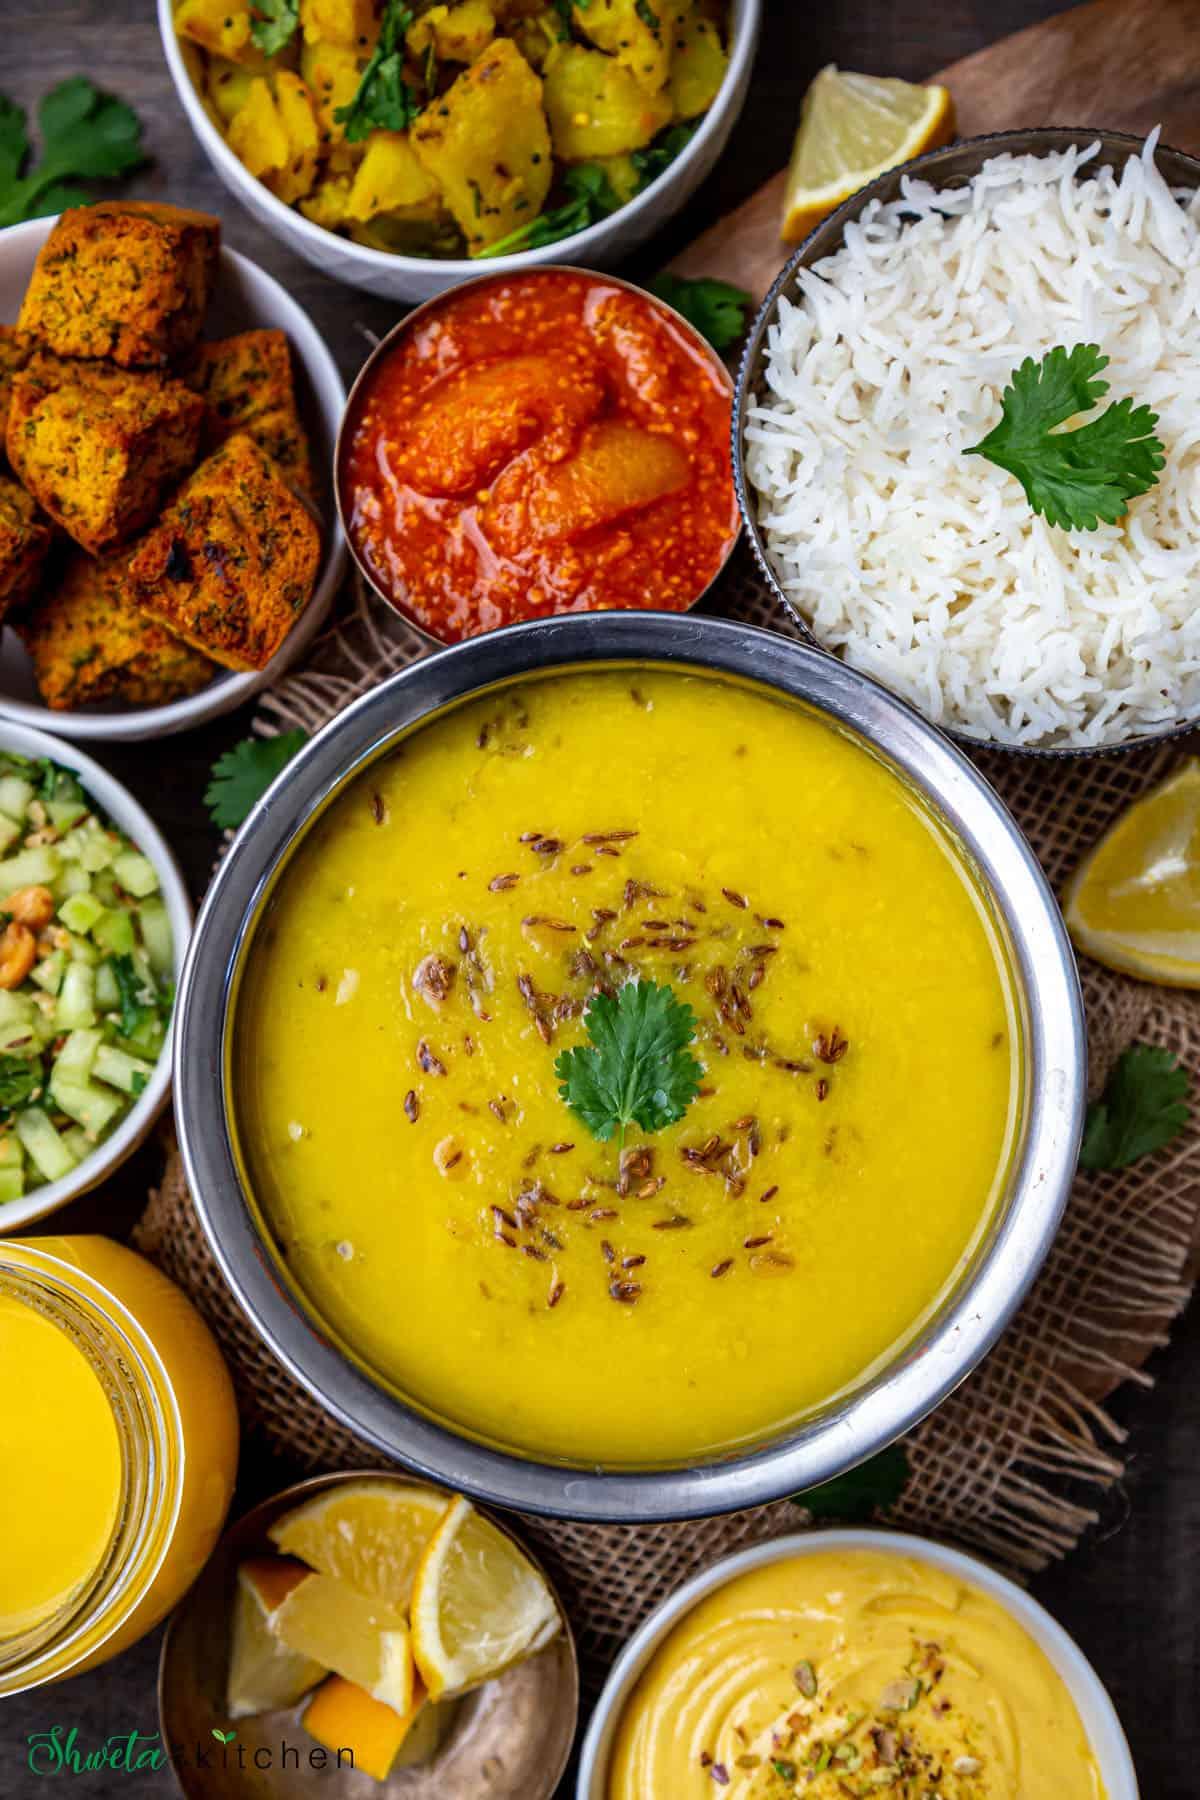 Bowl of Varan, rice, bhaji, pickle, kothimbir vadi, salad, ghee, lemon and mango shrikhand on side